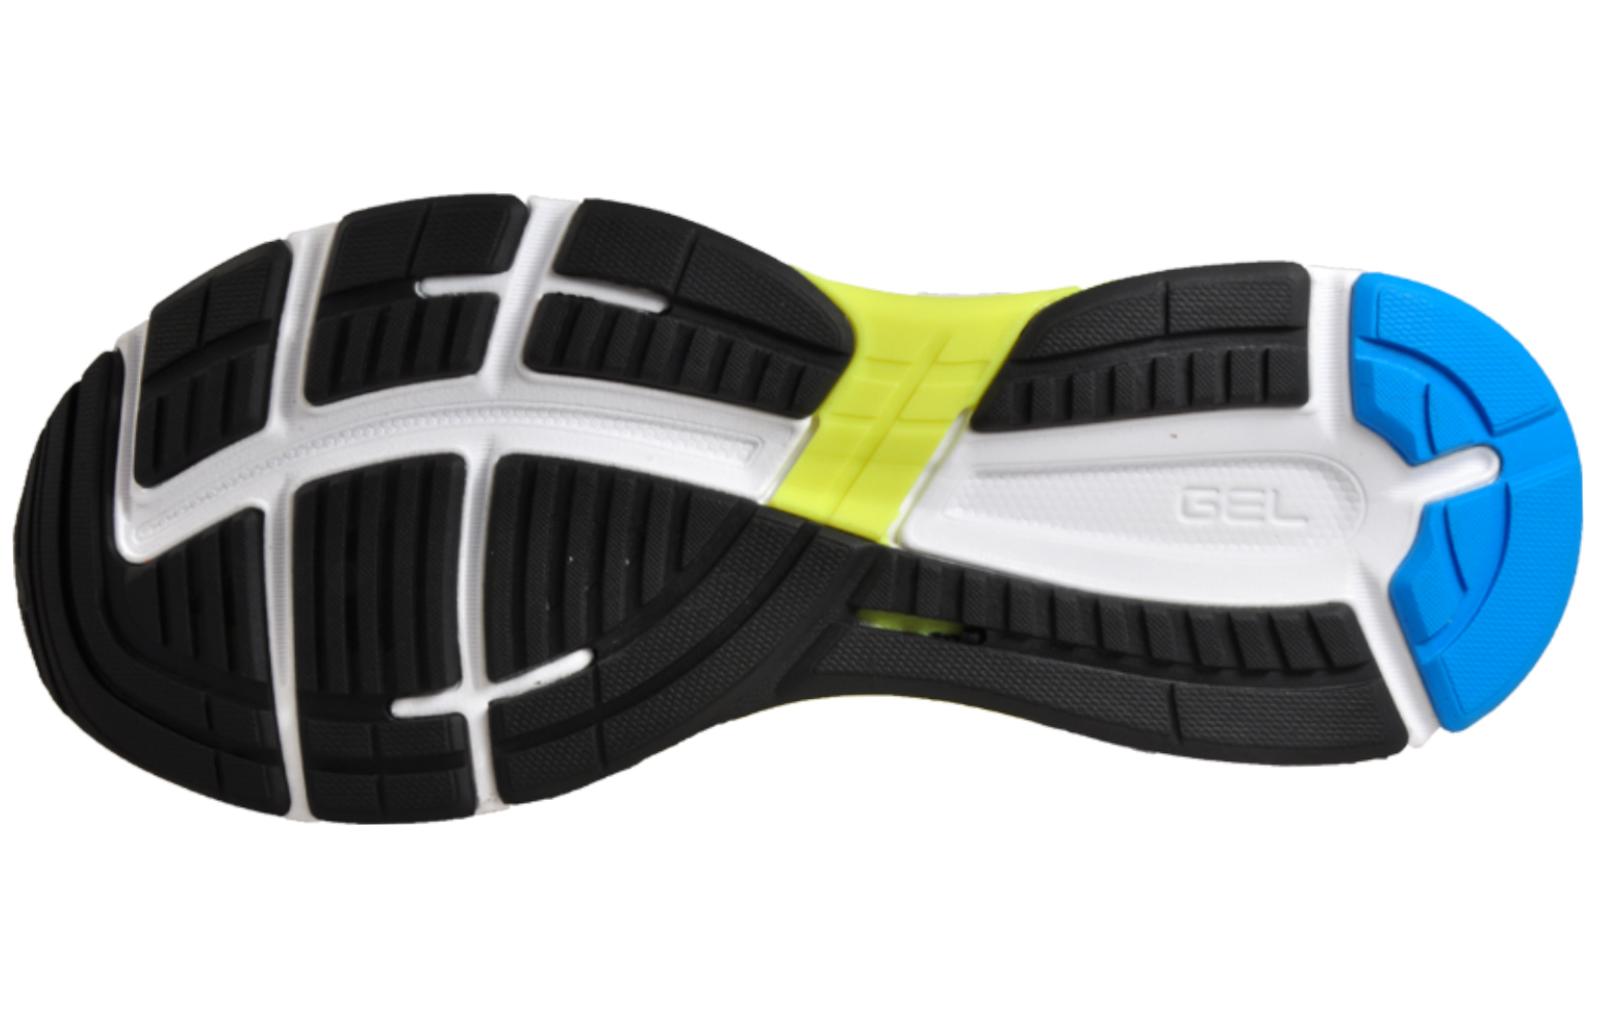 ce24b98ce4d Asics Gel Phoenix 9 Men s Premium Running Shoes Gym Fitness Trainers ...